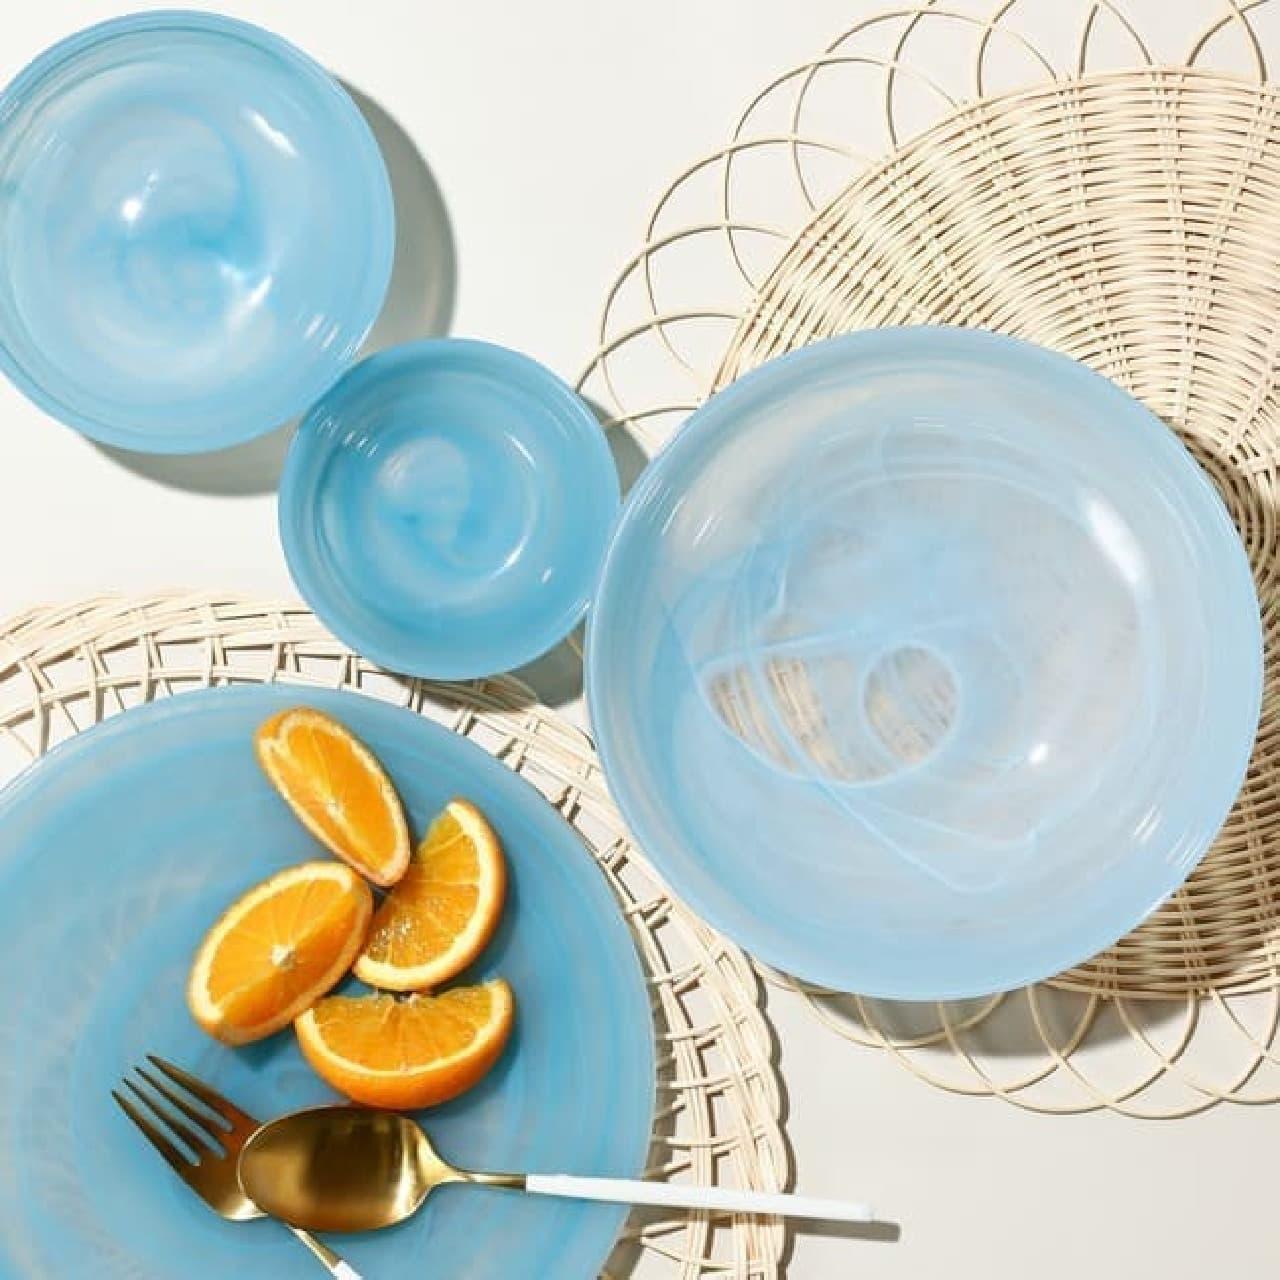 Francfranc(フランフラン)」が、夏の新作テーブルウェアシリーズを展開。